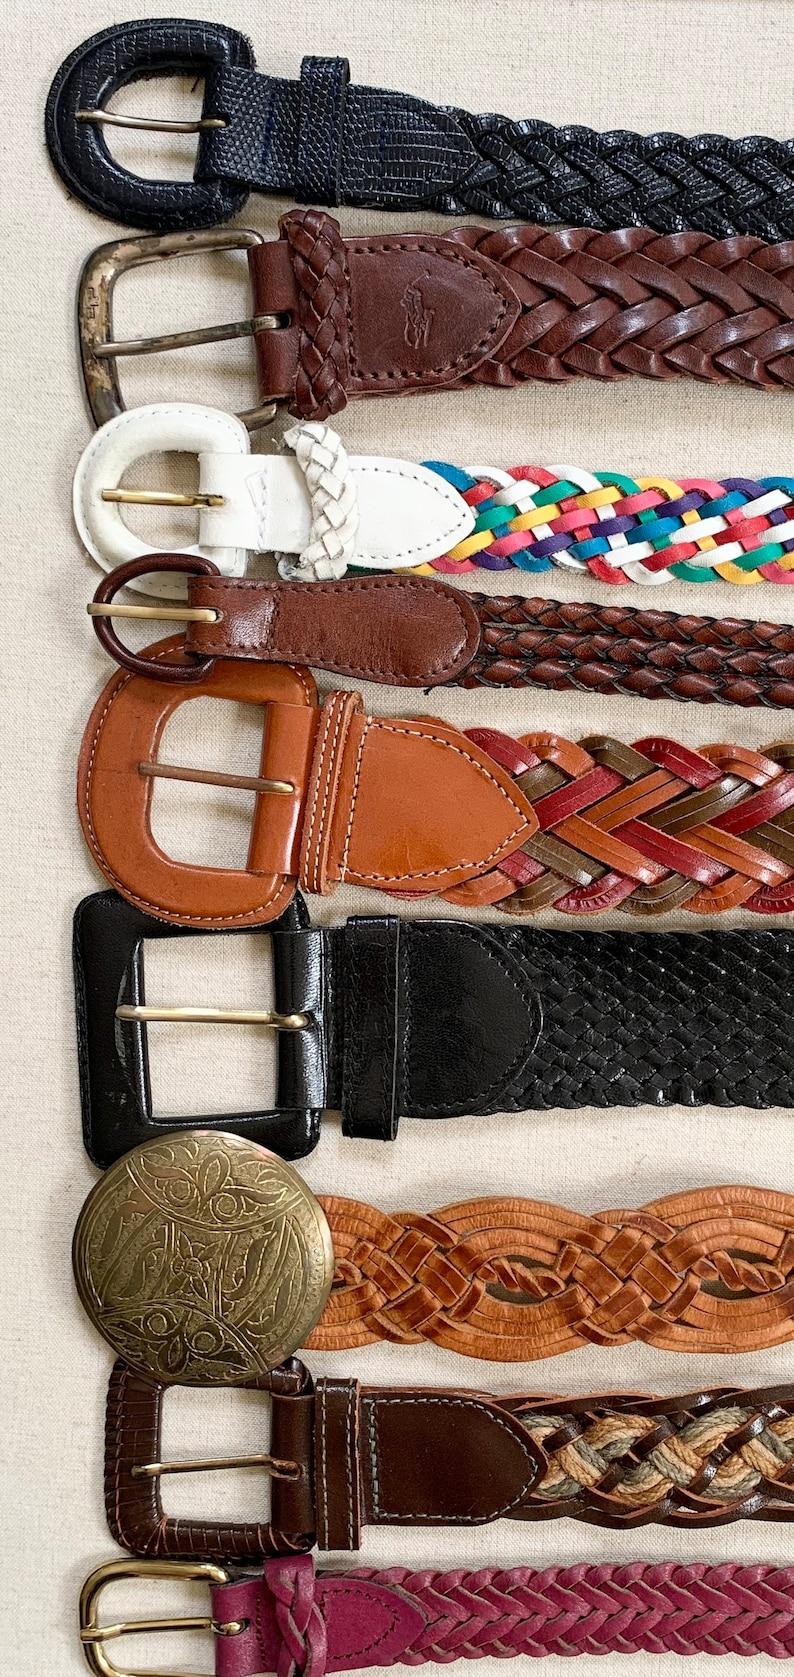 Braided Leather Belt Belts Vintage Leather Goods Woven Basketweave Woven Brown White Tan Black Mens Women/'s Belts